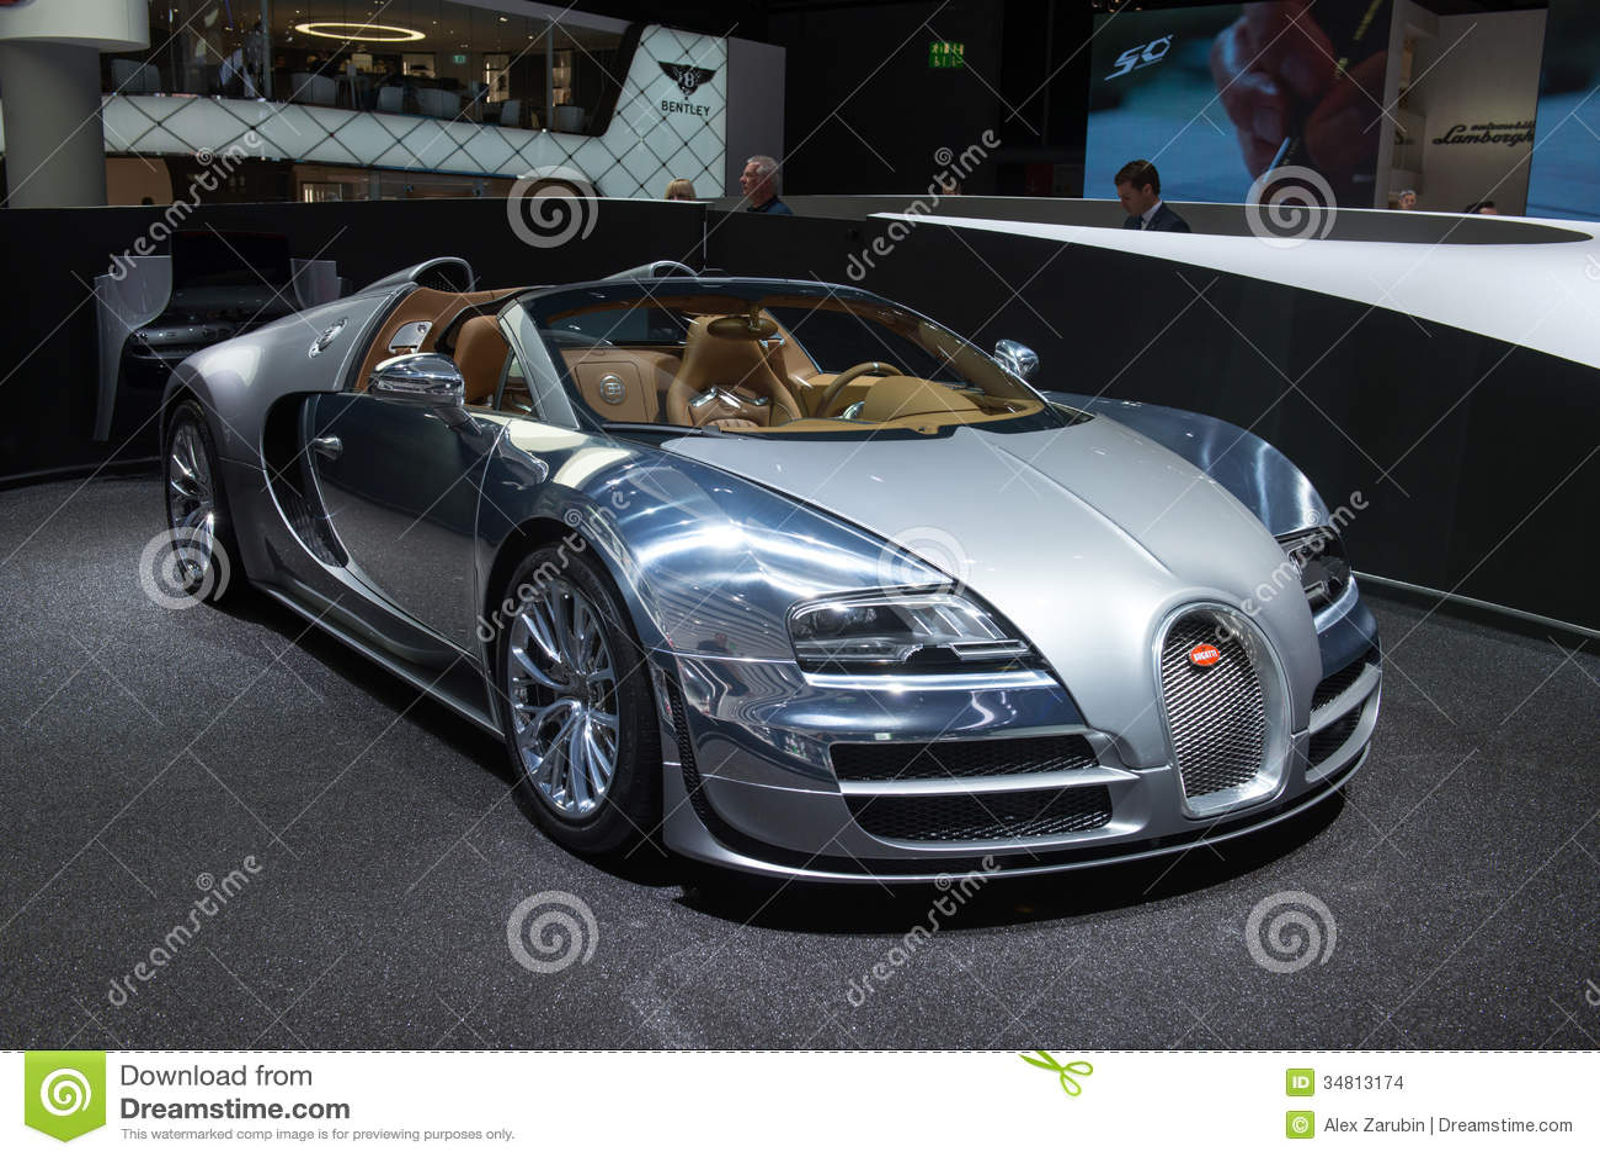 bugatti veyron 16 4 grand sport vitesse jean bugatti editorial stock image image 34813174. Black Bedroom Furniture Sets. Home Design Ideas